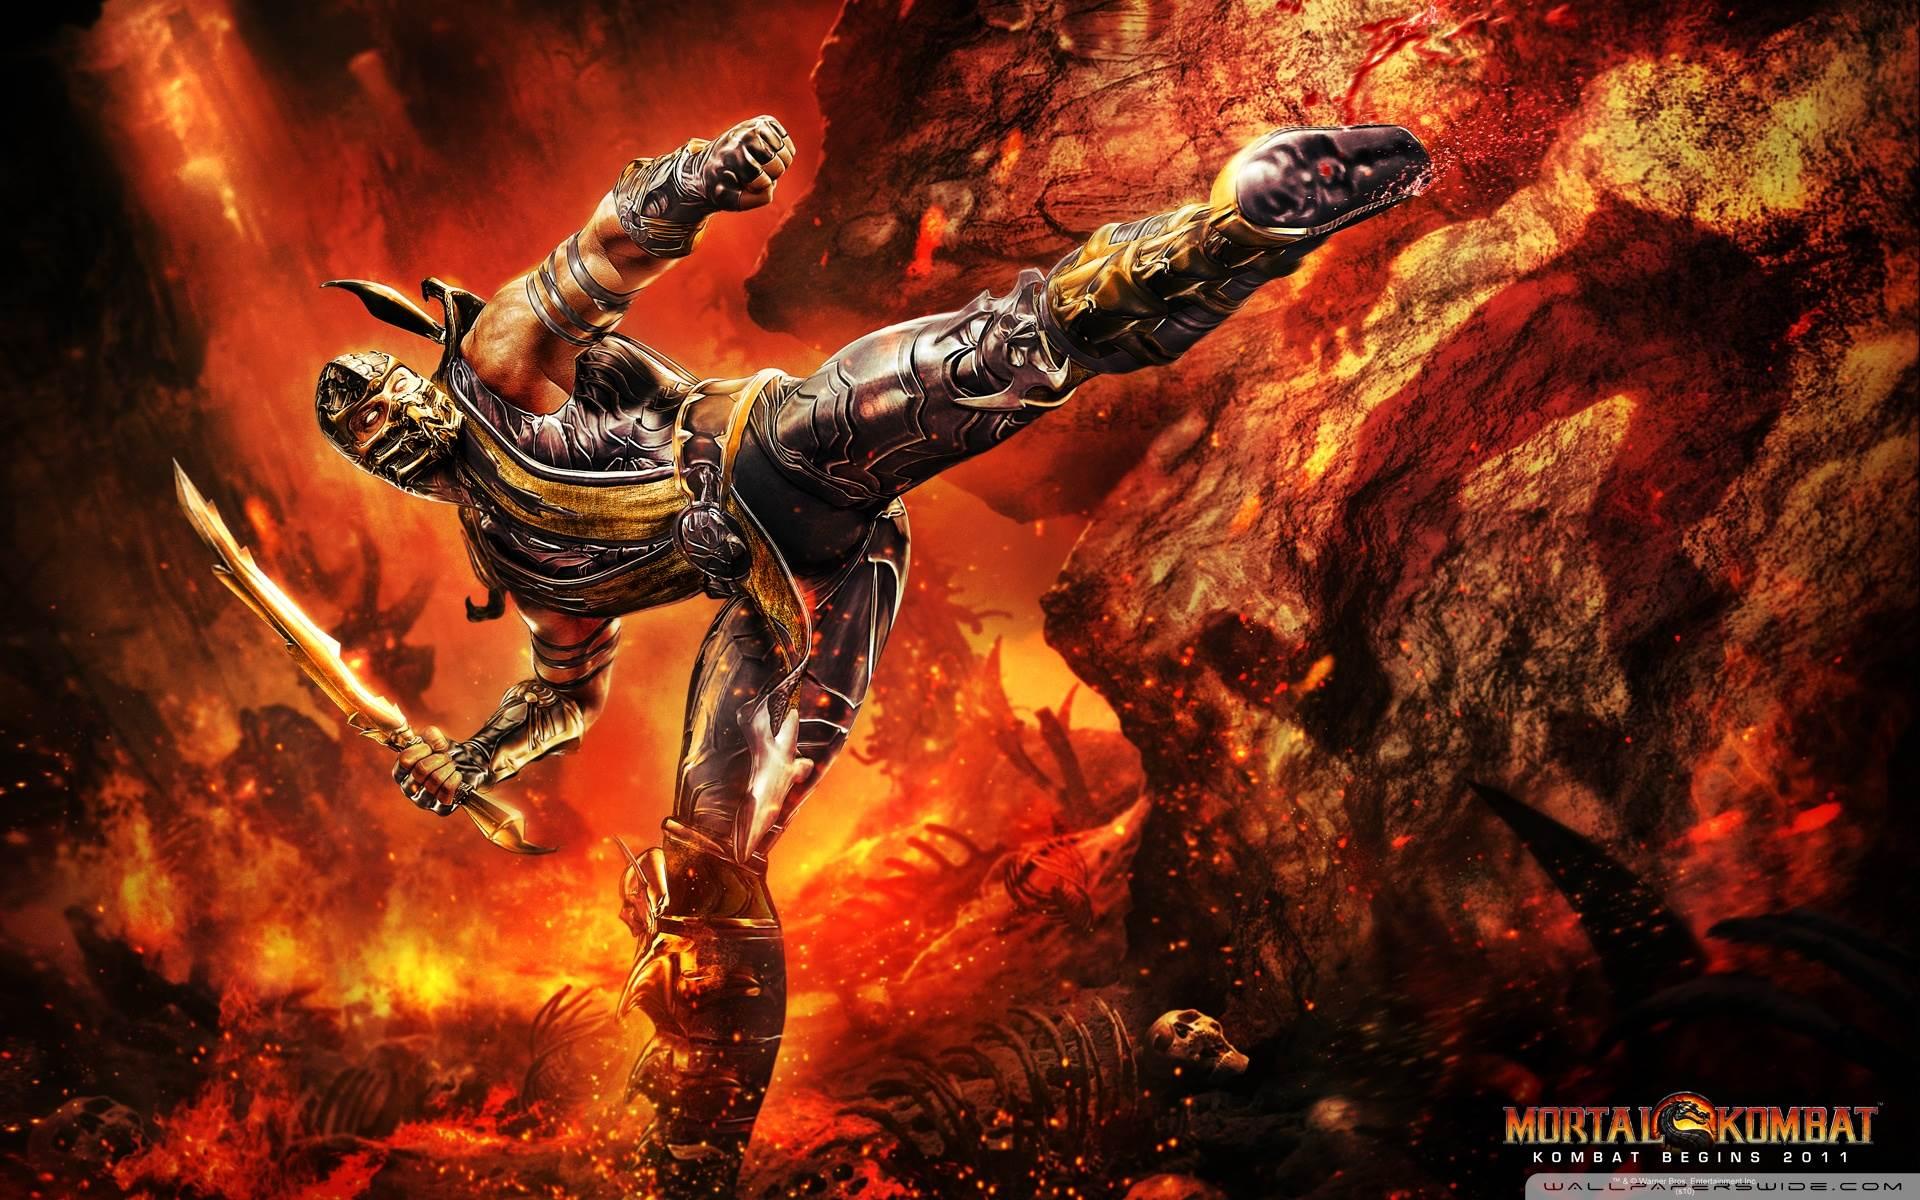 Mortal Kombat Logo Wallpapers Hd Wallpapers 1920x1200